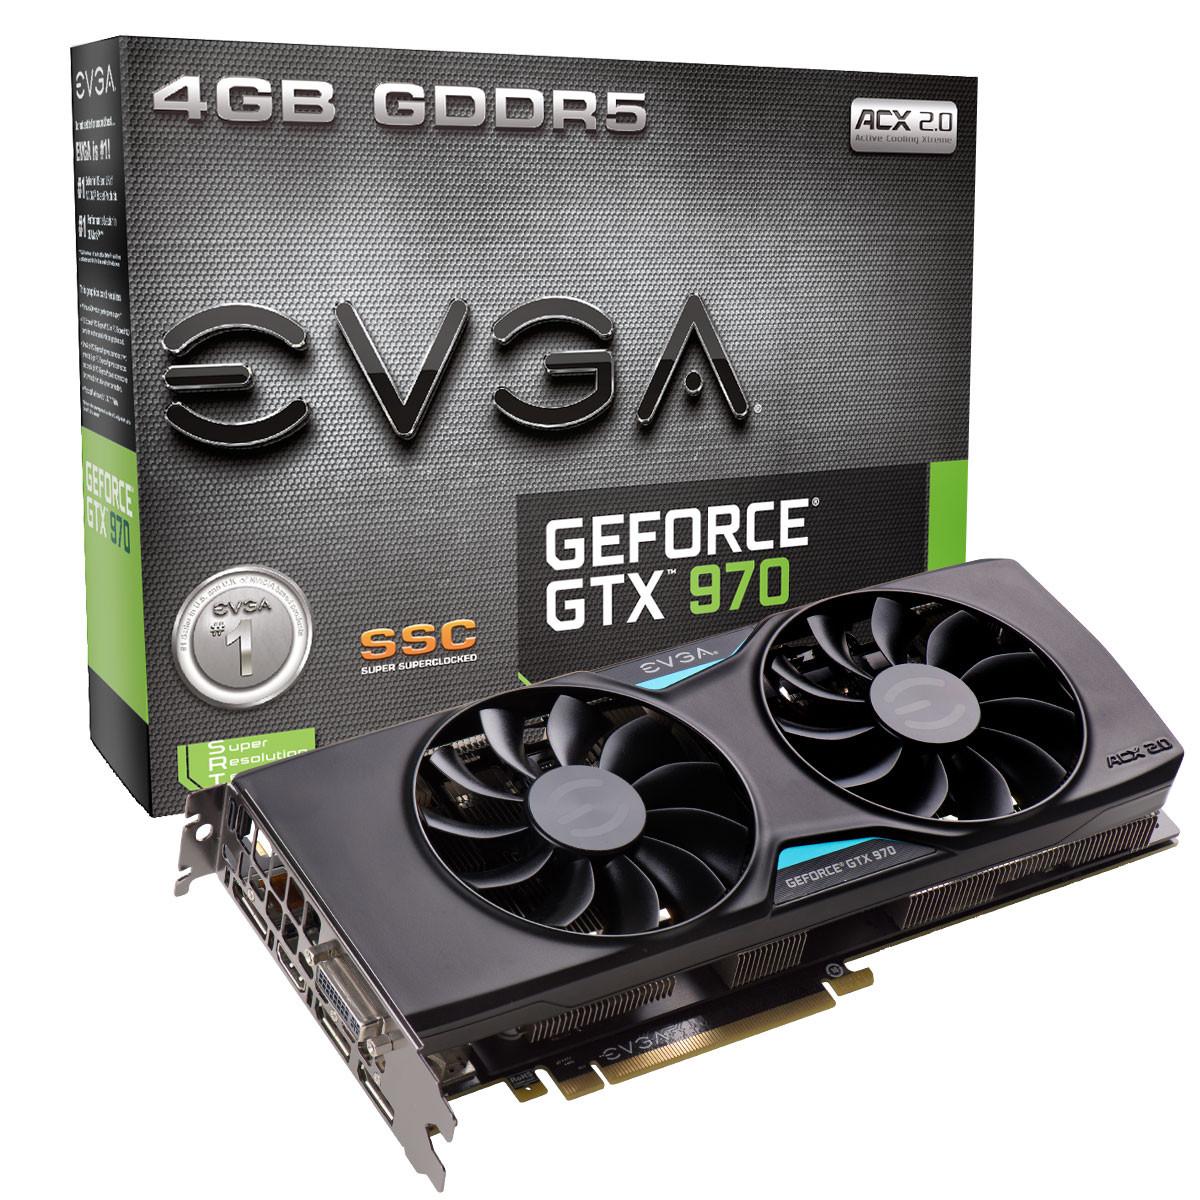 "Видеокарта EVGA GTX970 SSC 4GB GDDR5 ""Over-Stock"" Б/У"